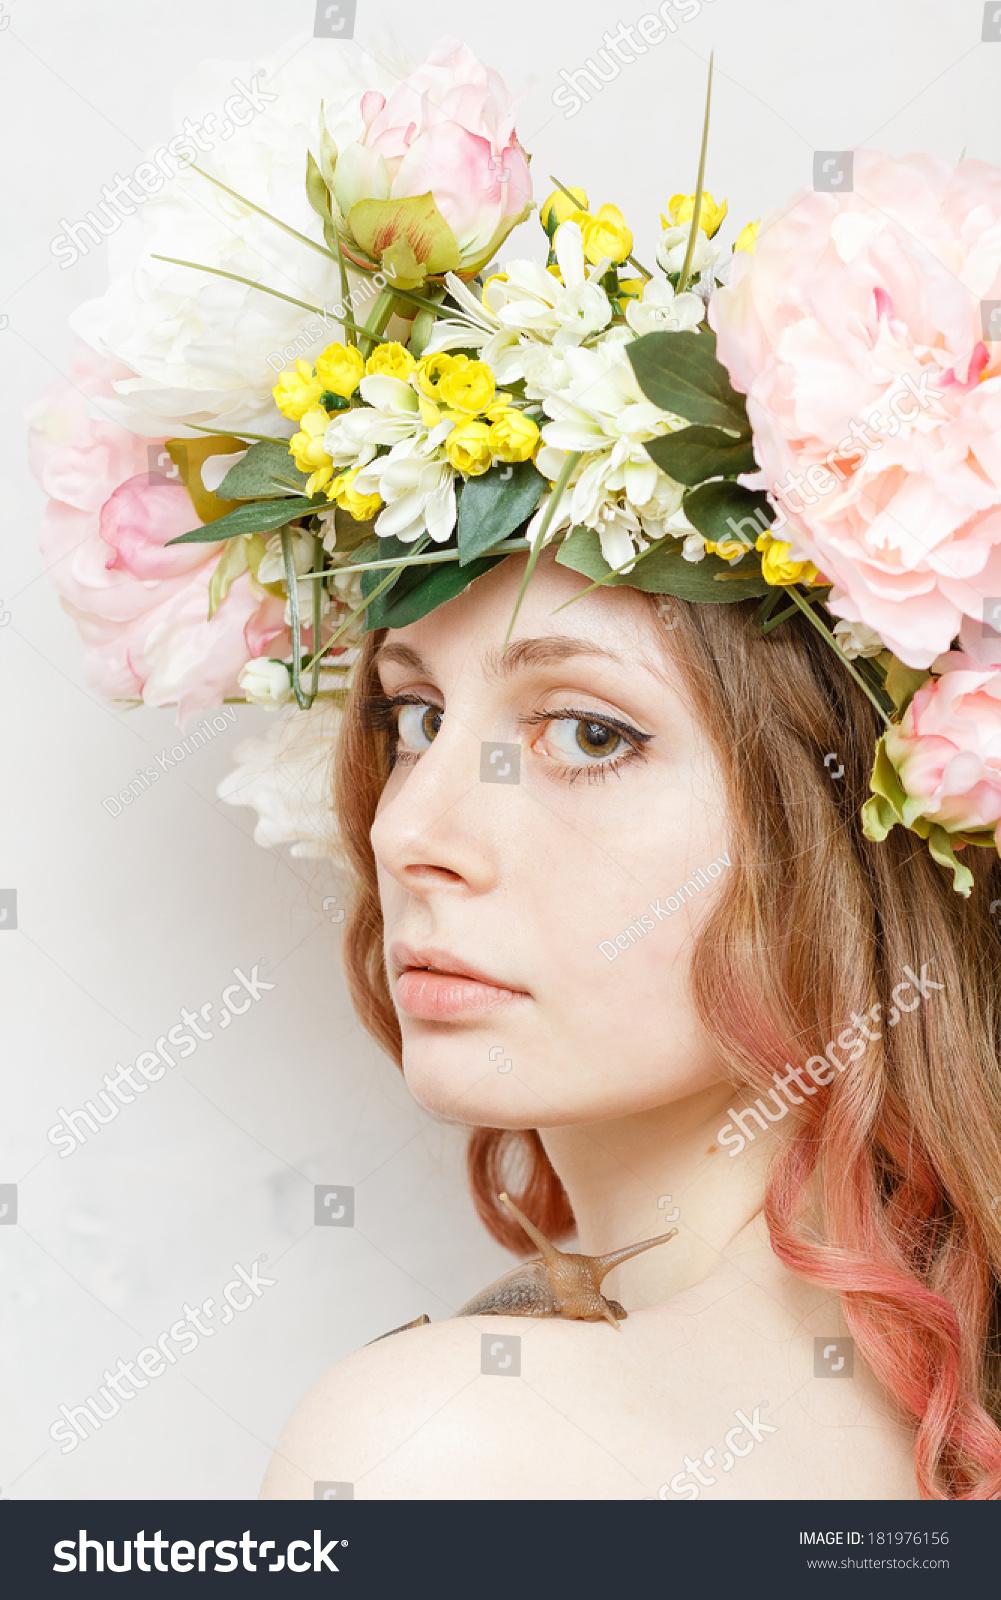 Calm Pretty Girl Snail Flower Crown Stock Photo Royalty Free